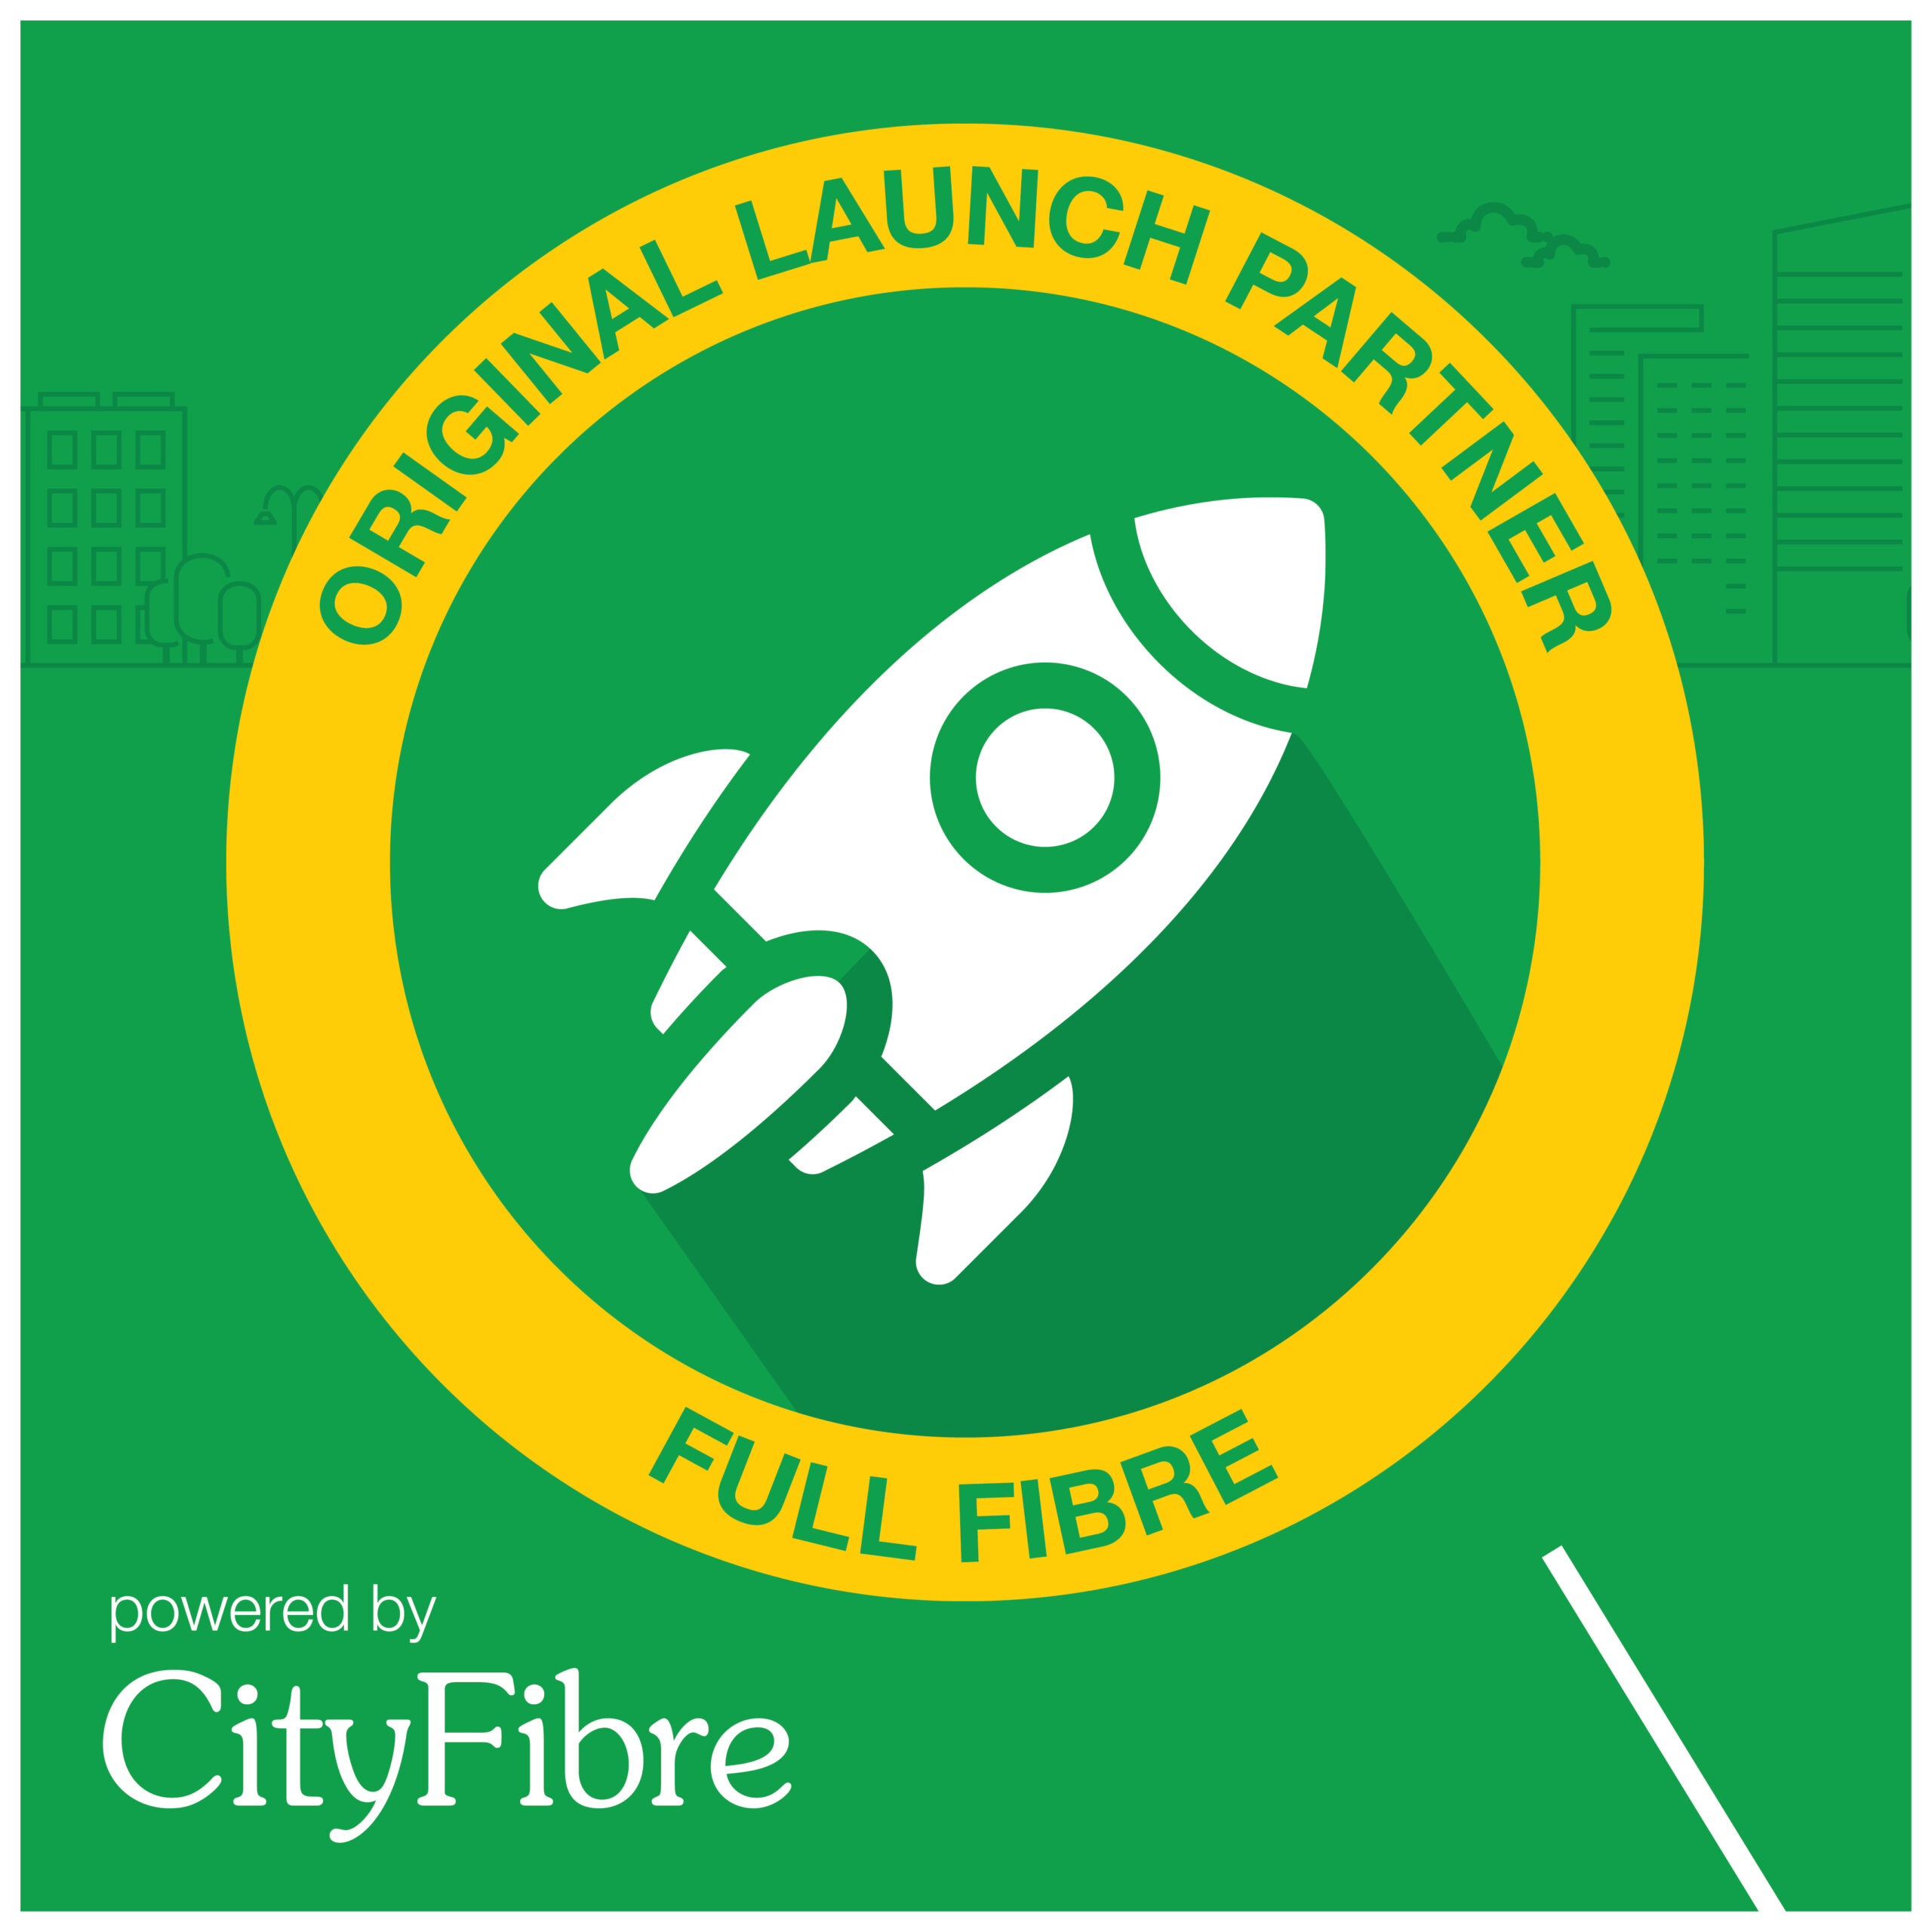 CityFibre official partner logo